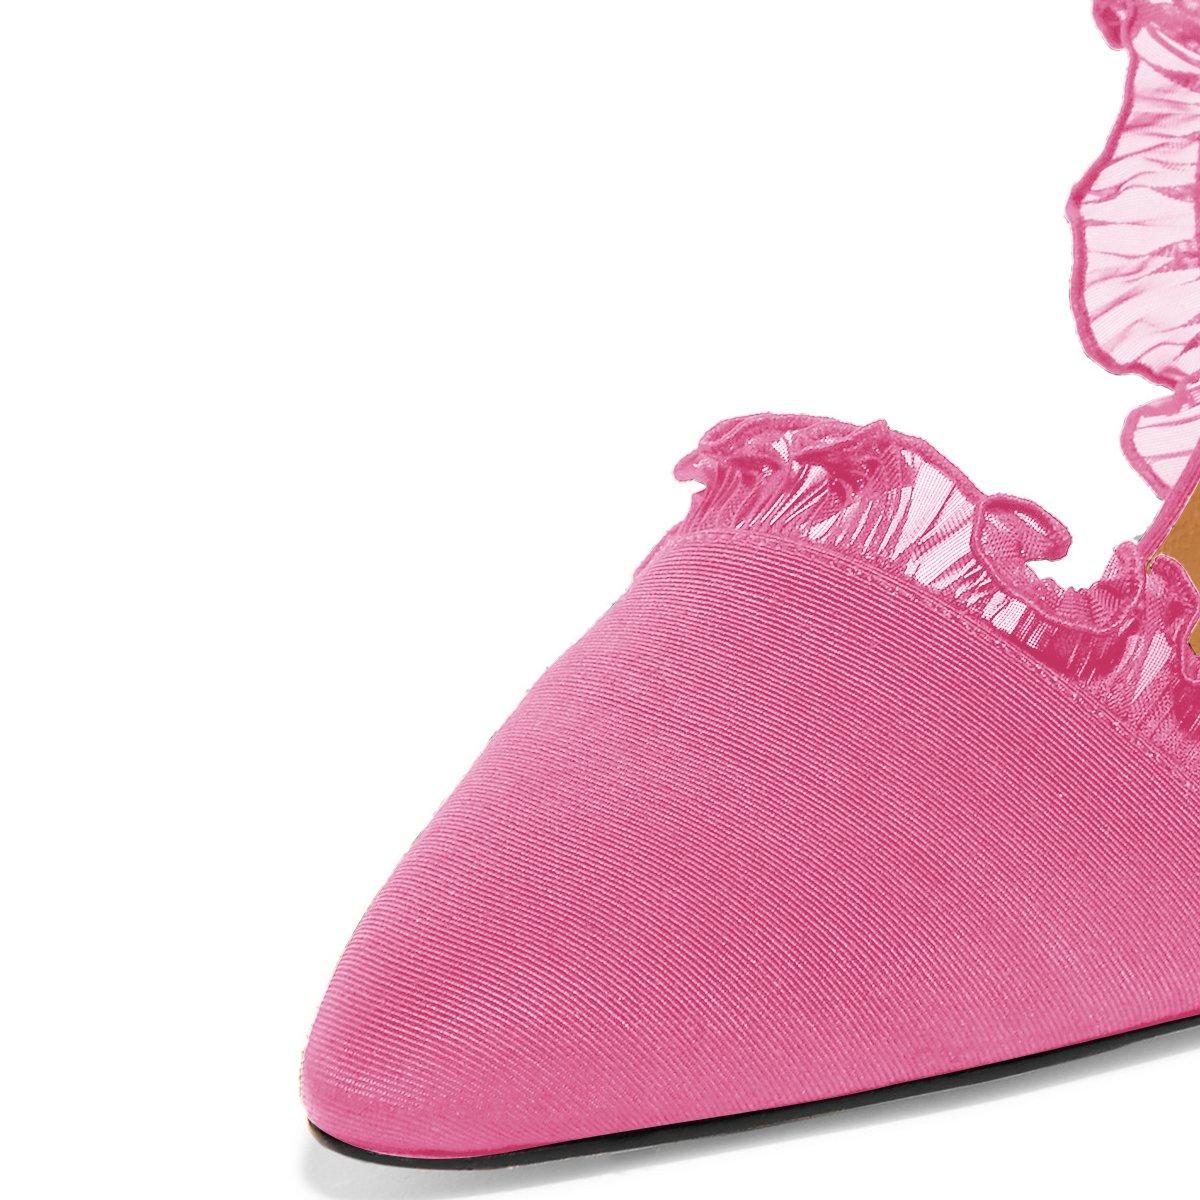 XYD Women Lace D'Orsay Pumps Pointed Toe Stiletto High Heels Slip on Dress Wedding Bridal Shoes B07BHGDSVZ 6 B(M) US|Pink